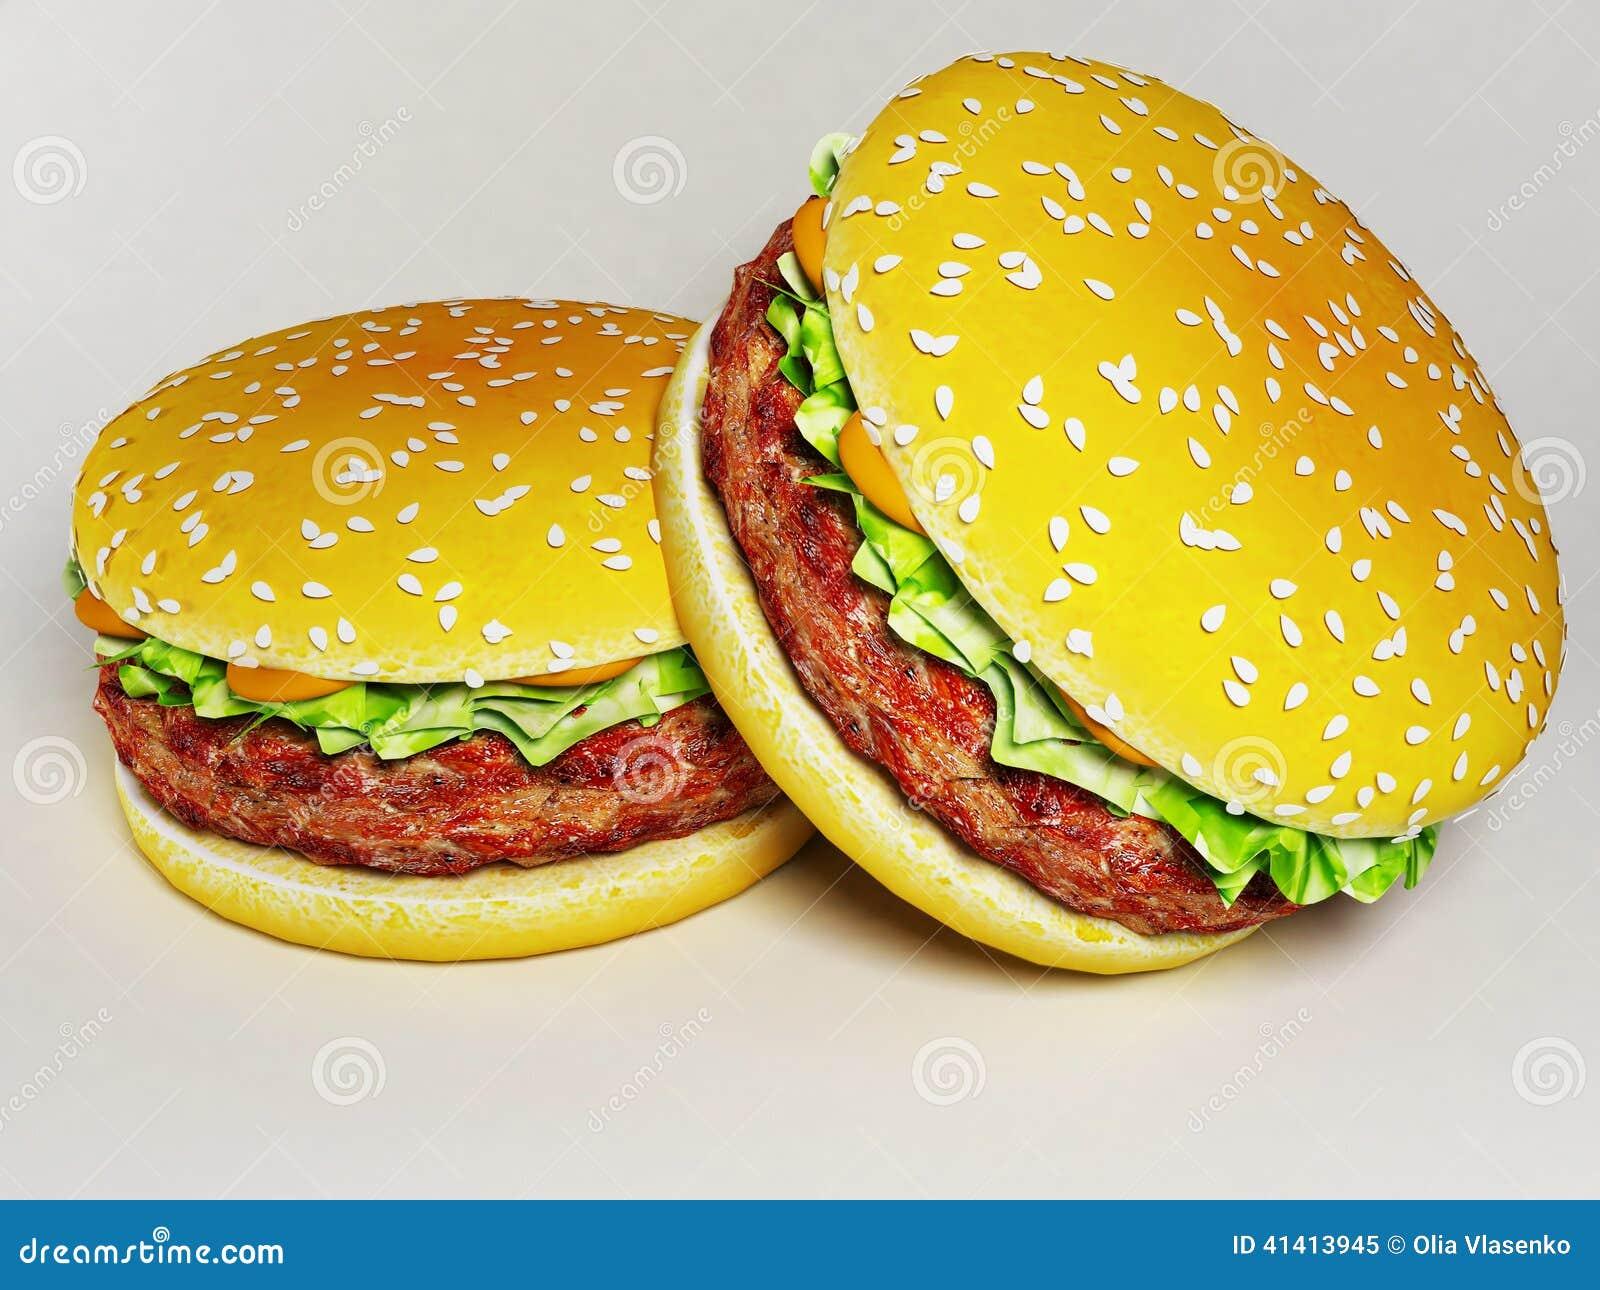 Big, Fat, Juicy Cheeseburger